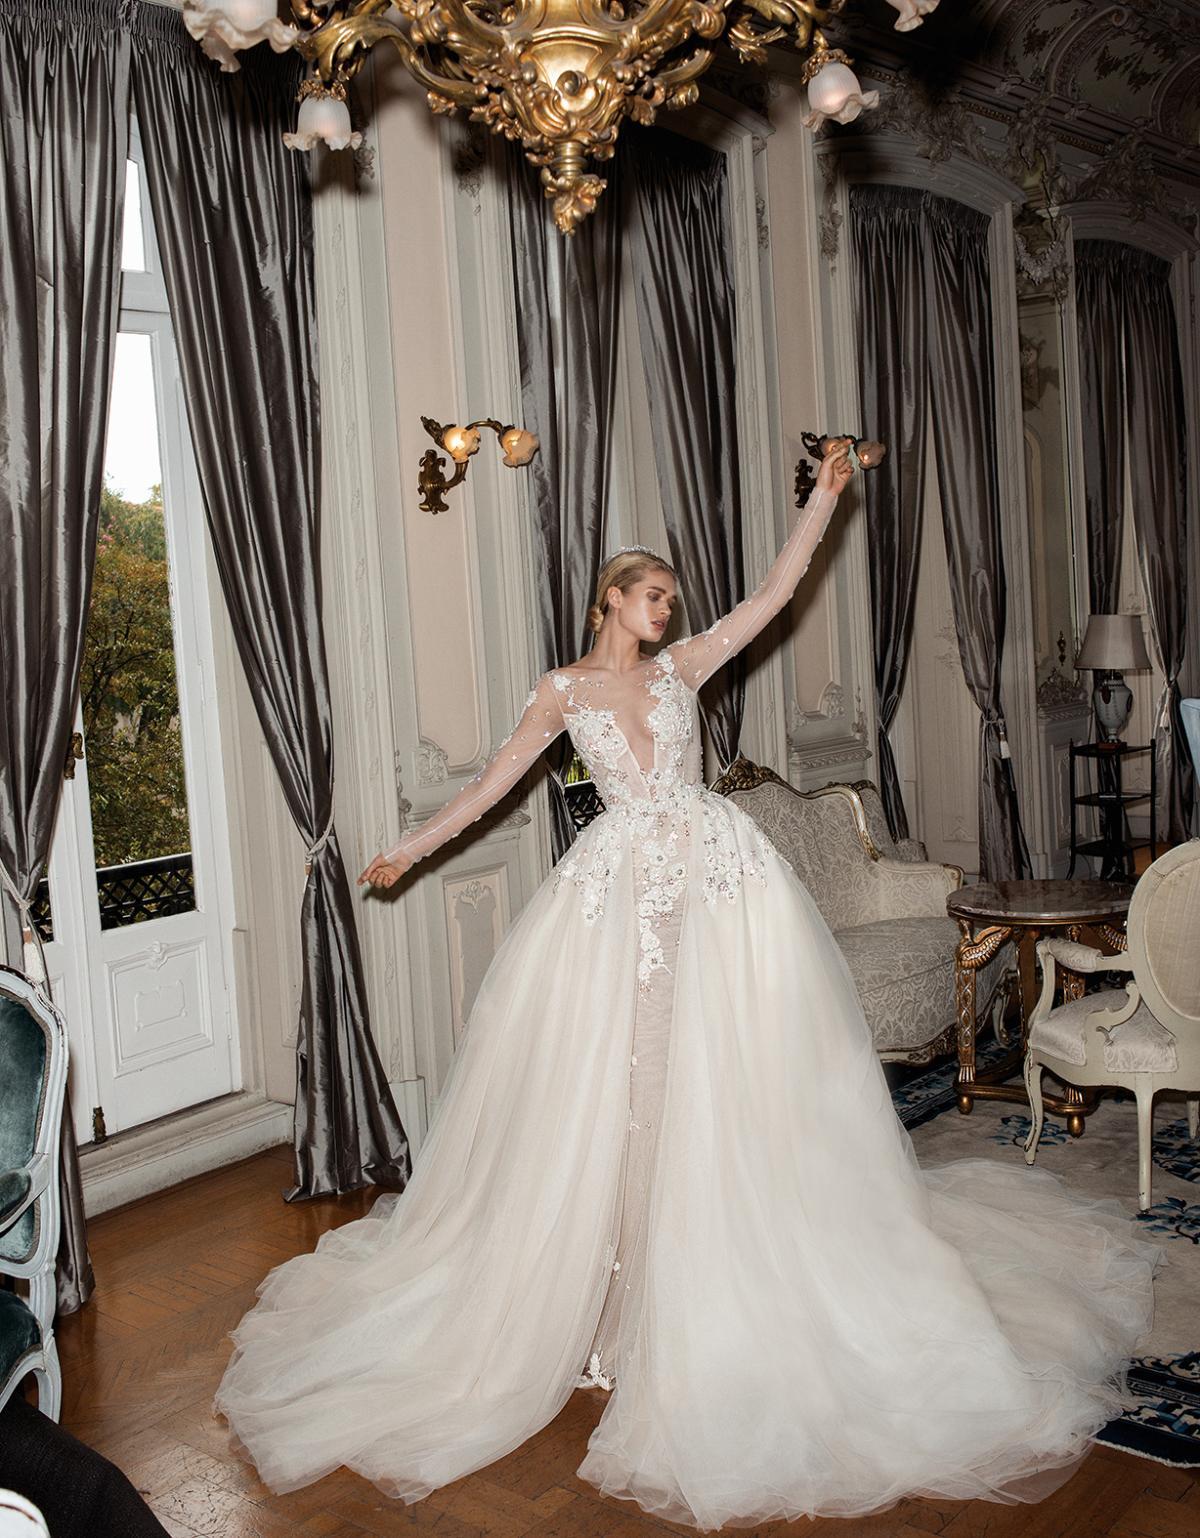 Nevis ball gown